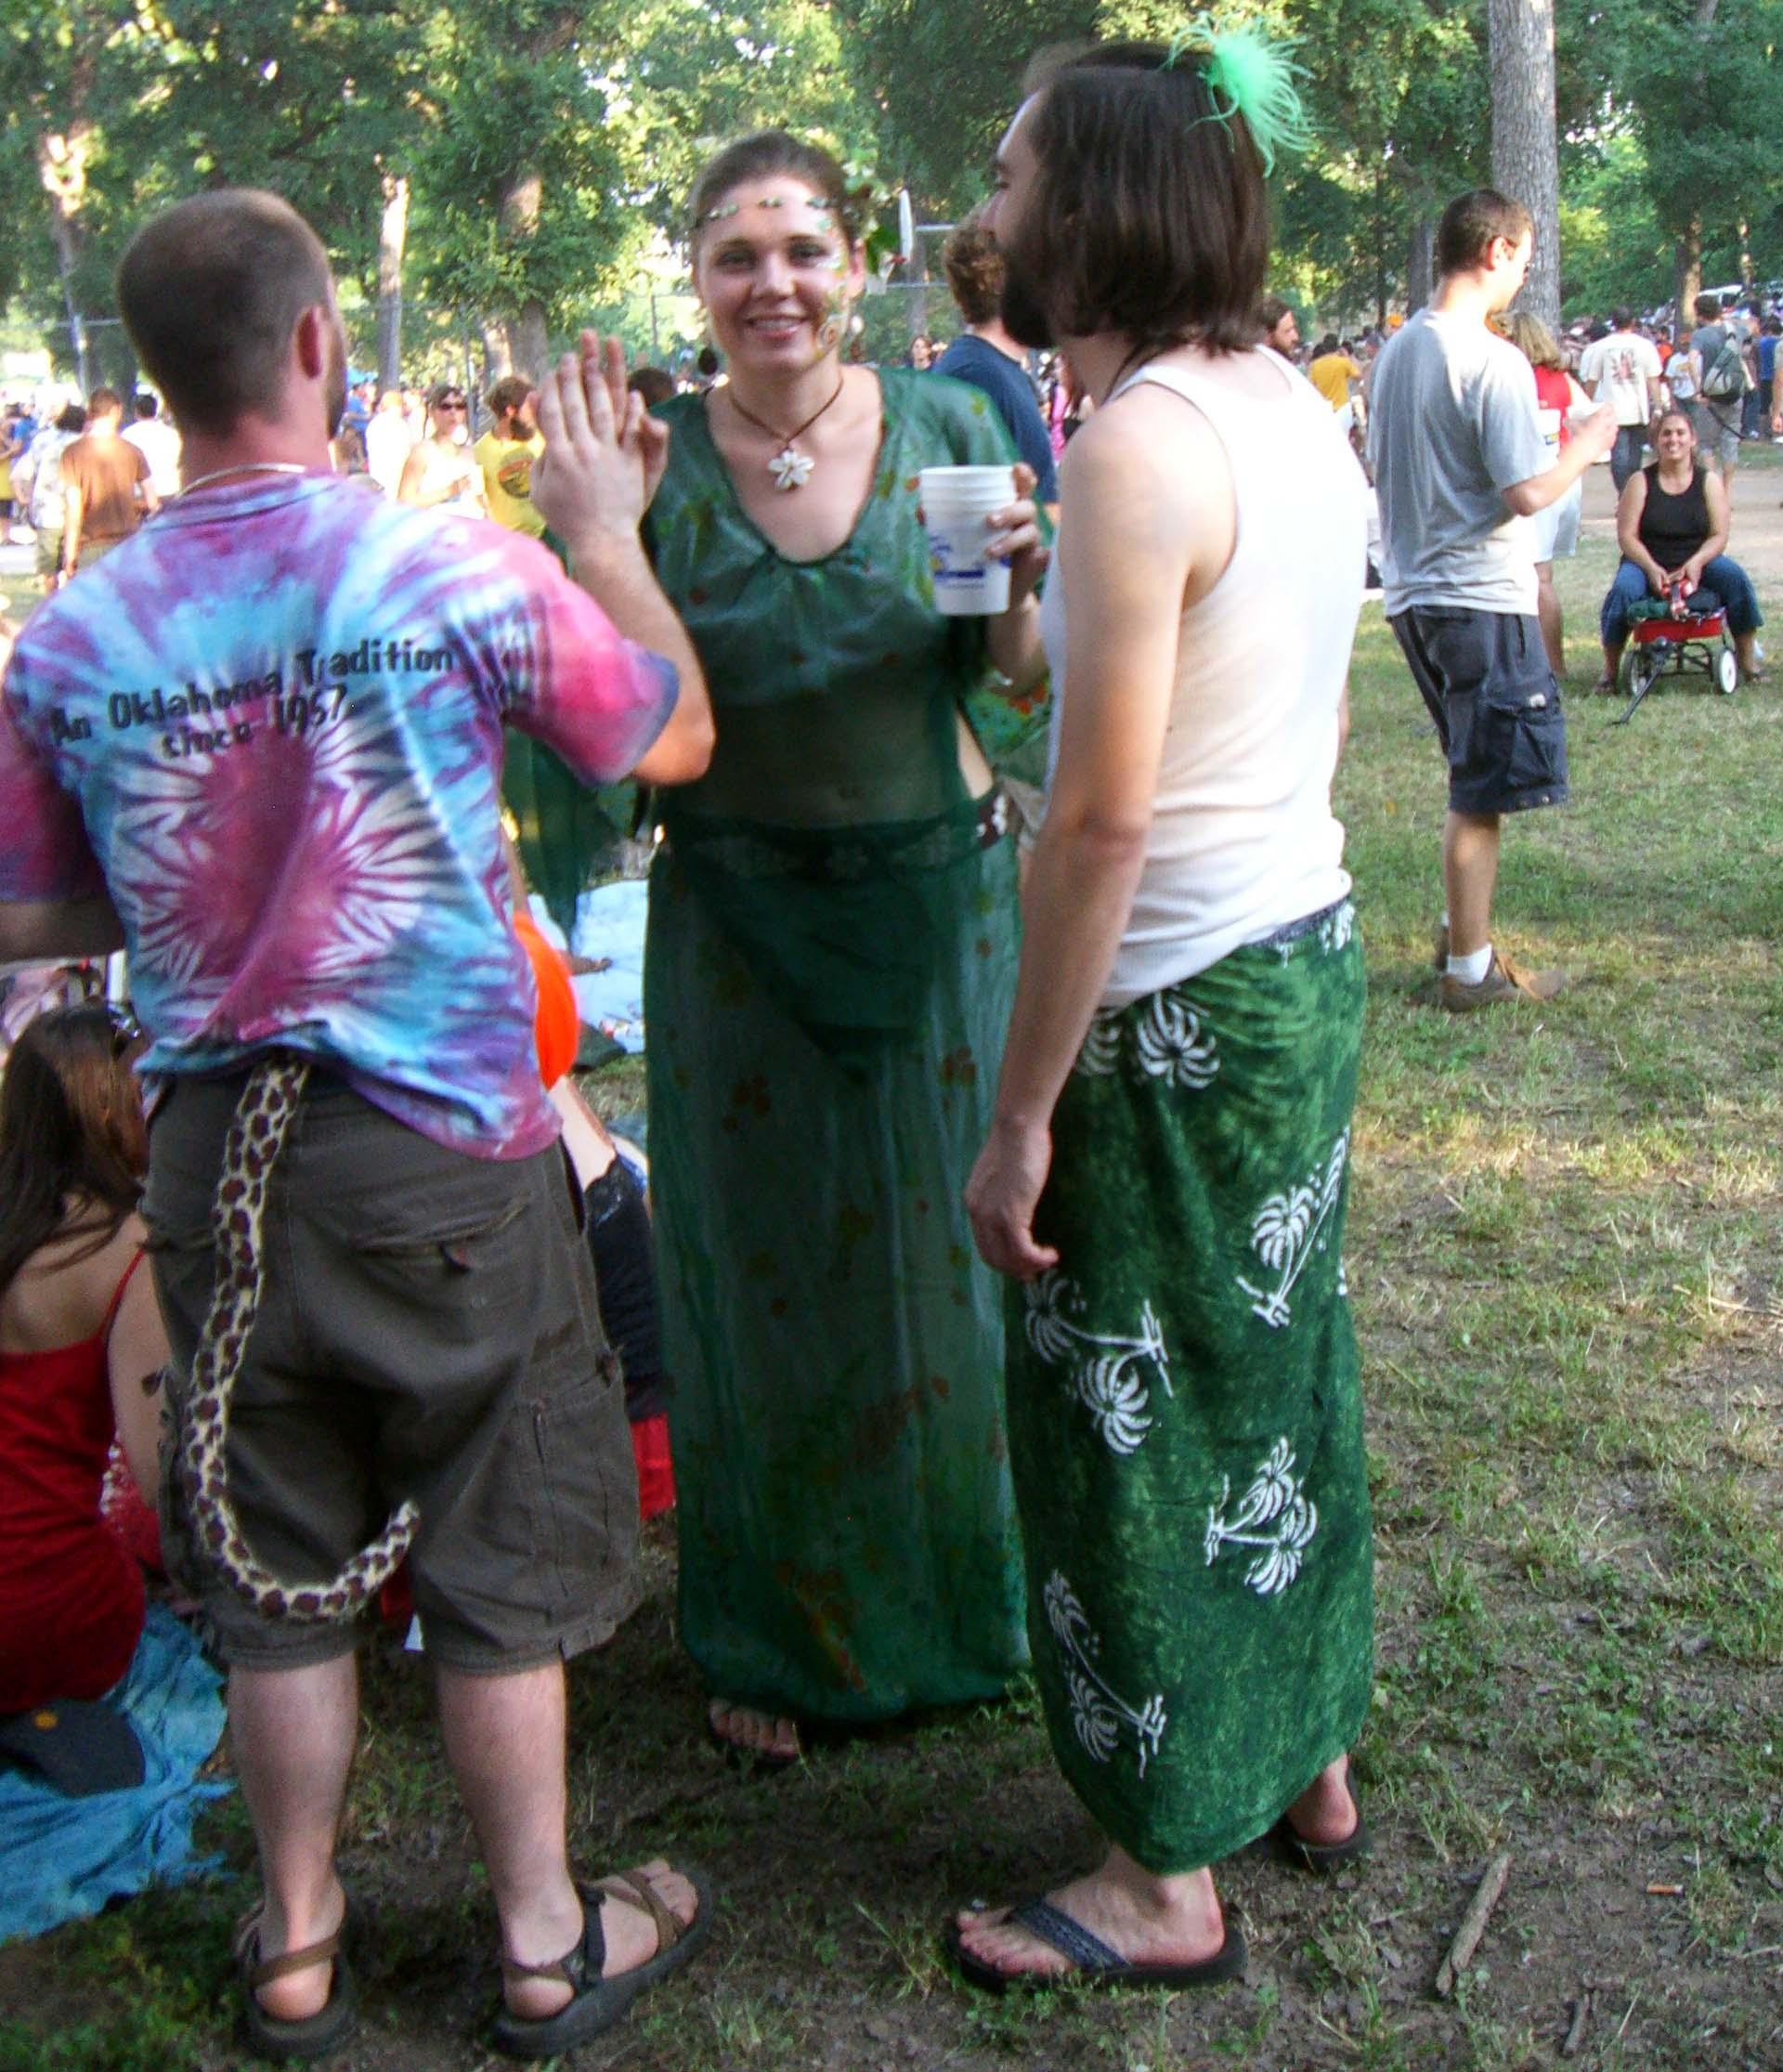 Tie-dye, snake-shaped tail, long green garments